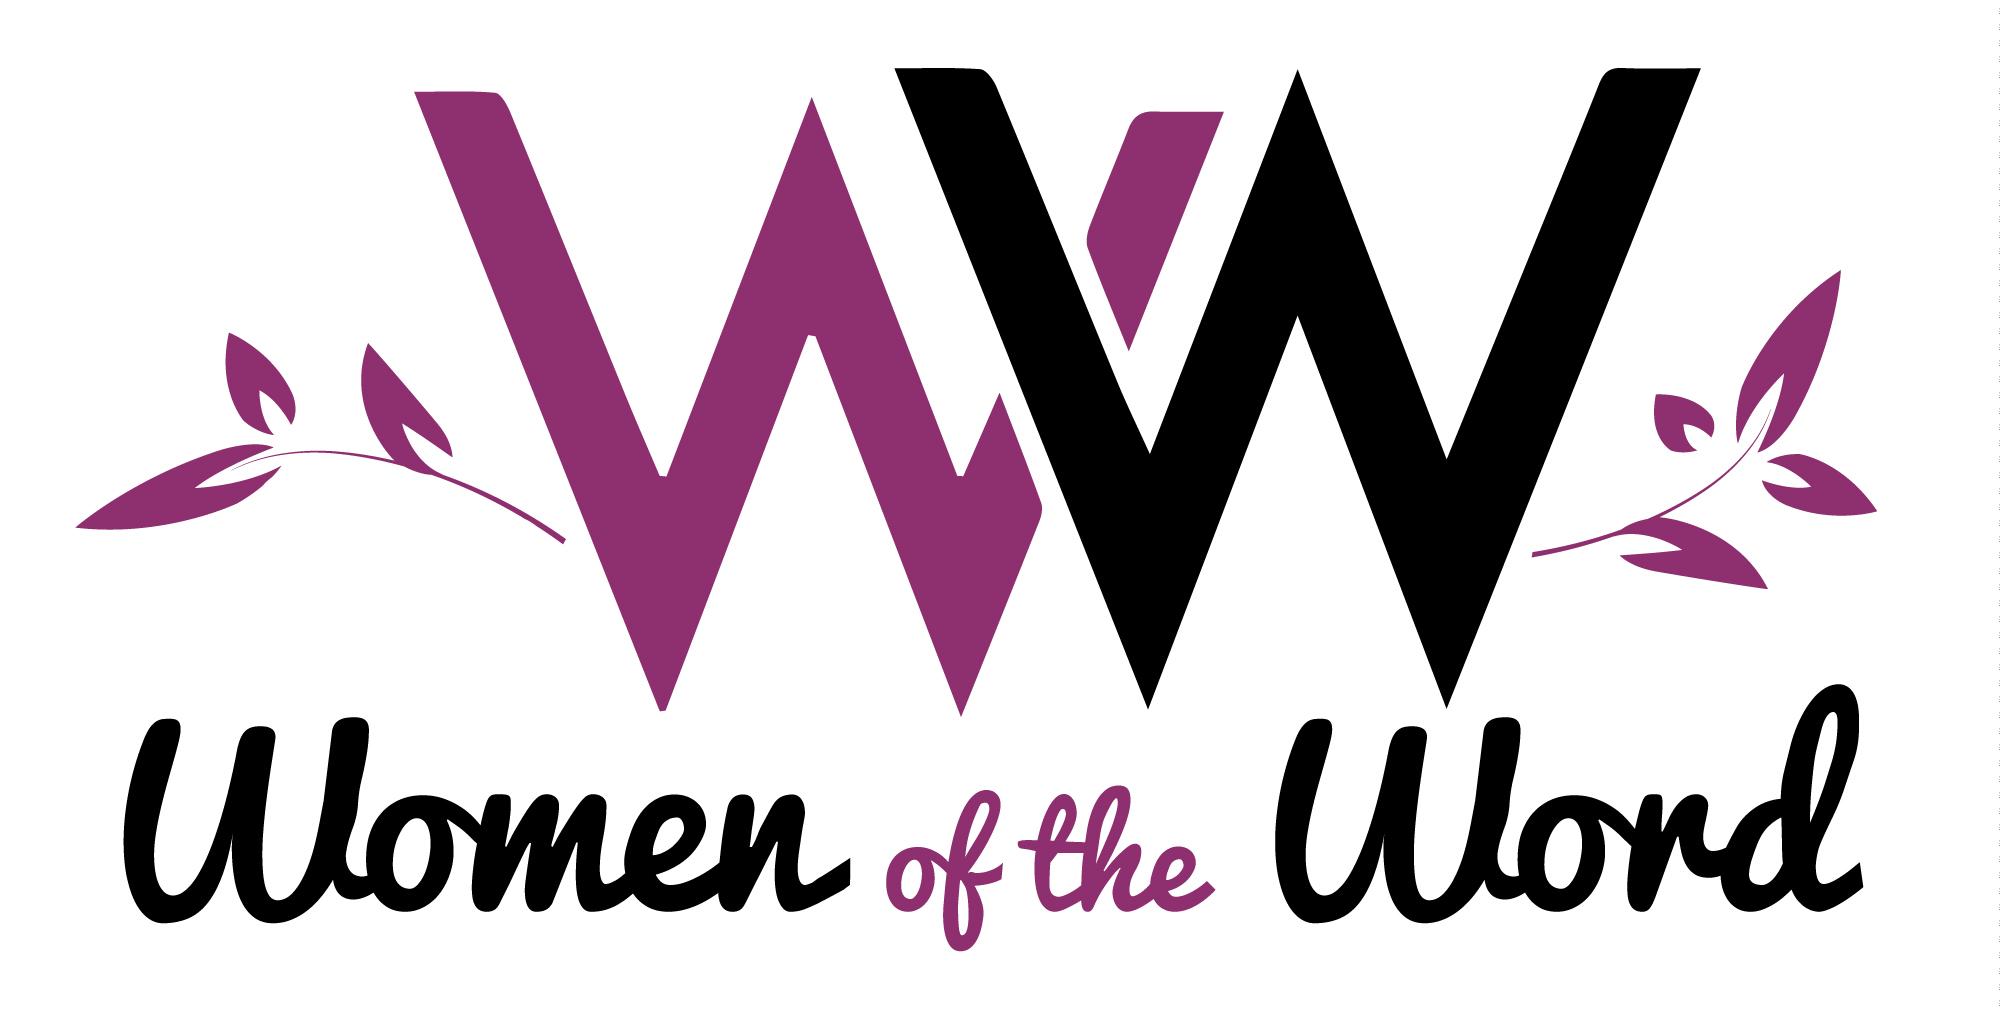 Women-of-the-word-logo.jpg